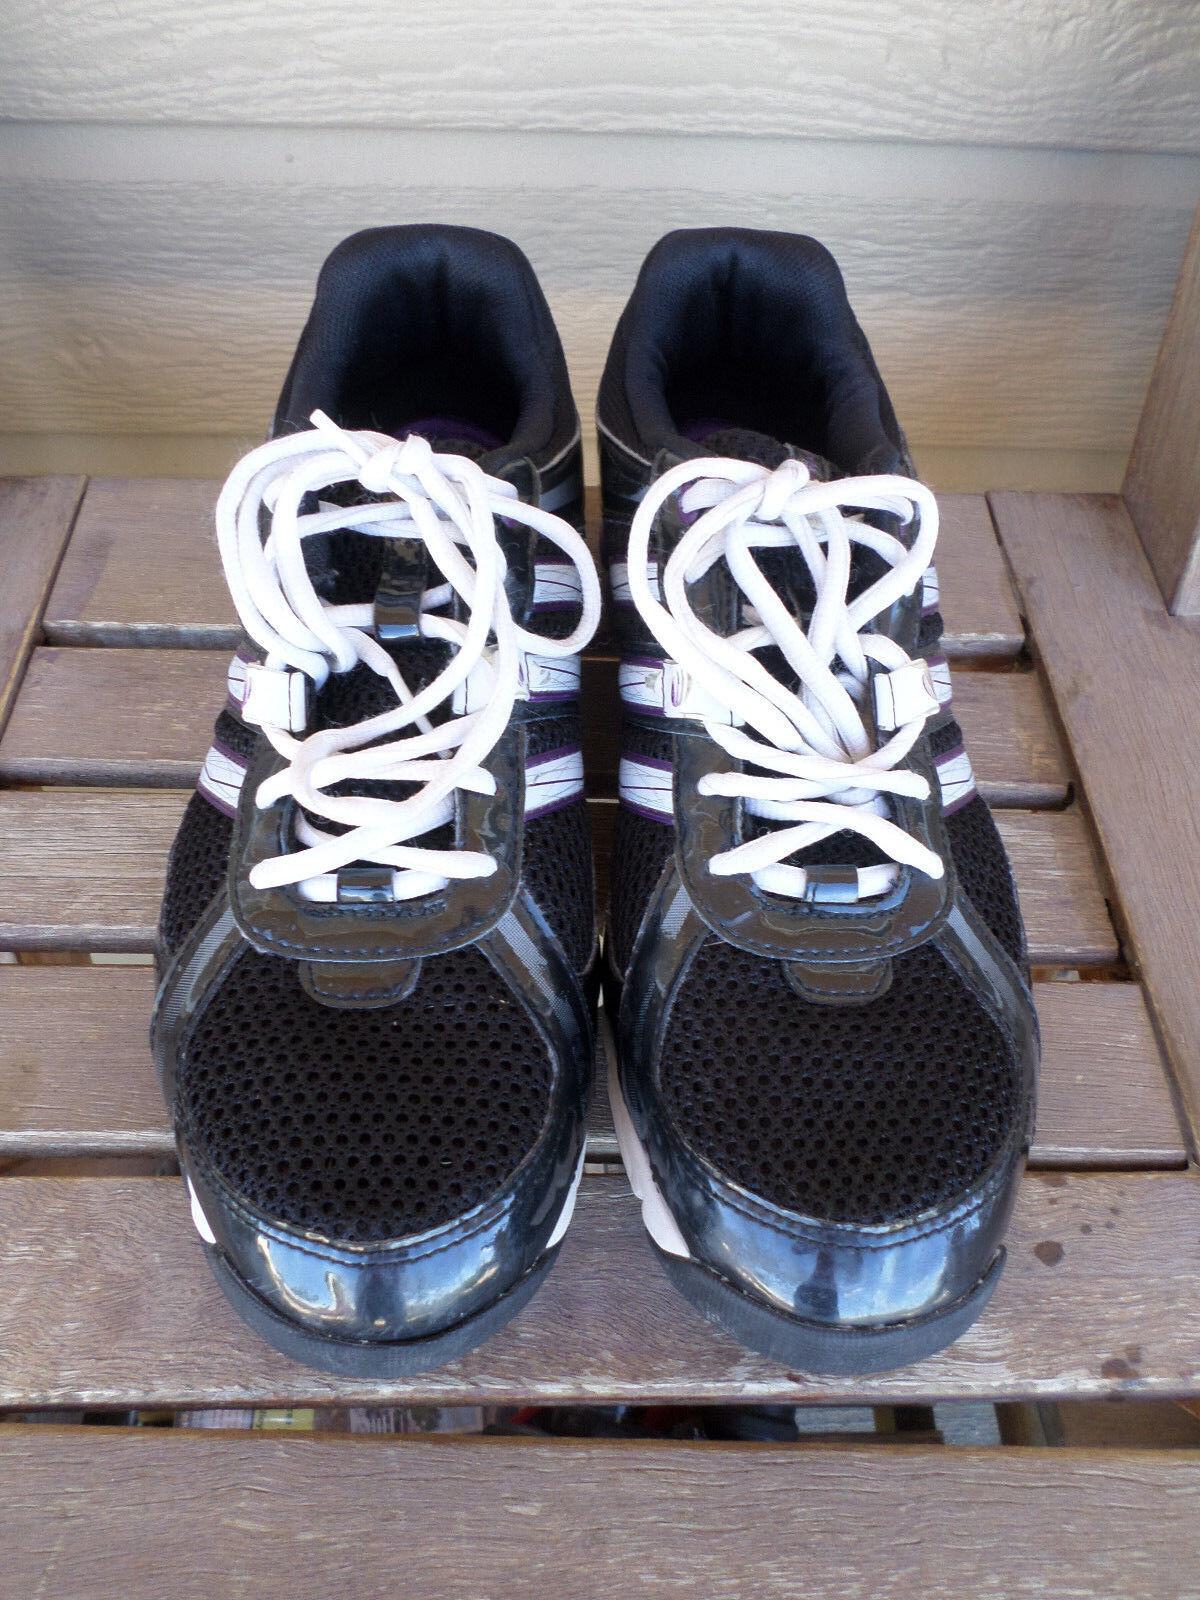 94e5526db Adidas nero 3 d attutire le scarpe da ginnastica femminile 10 | Shopping  Online | Sig